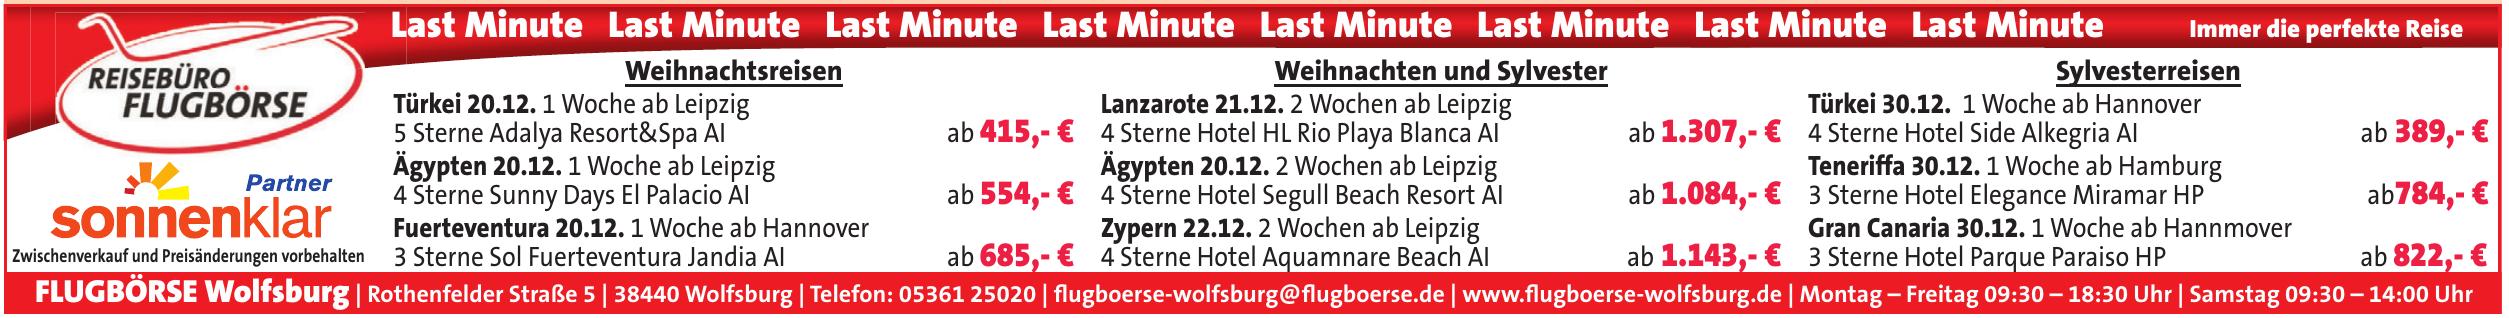 Flugbörse Wolfsburg